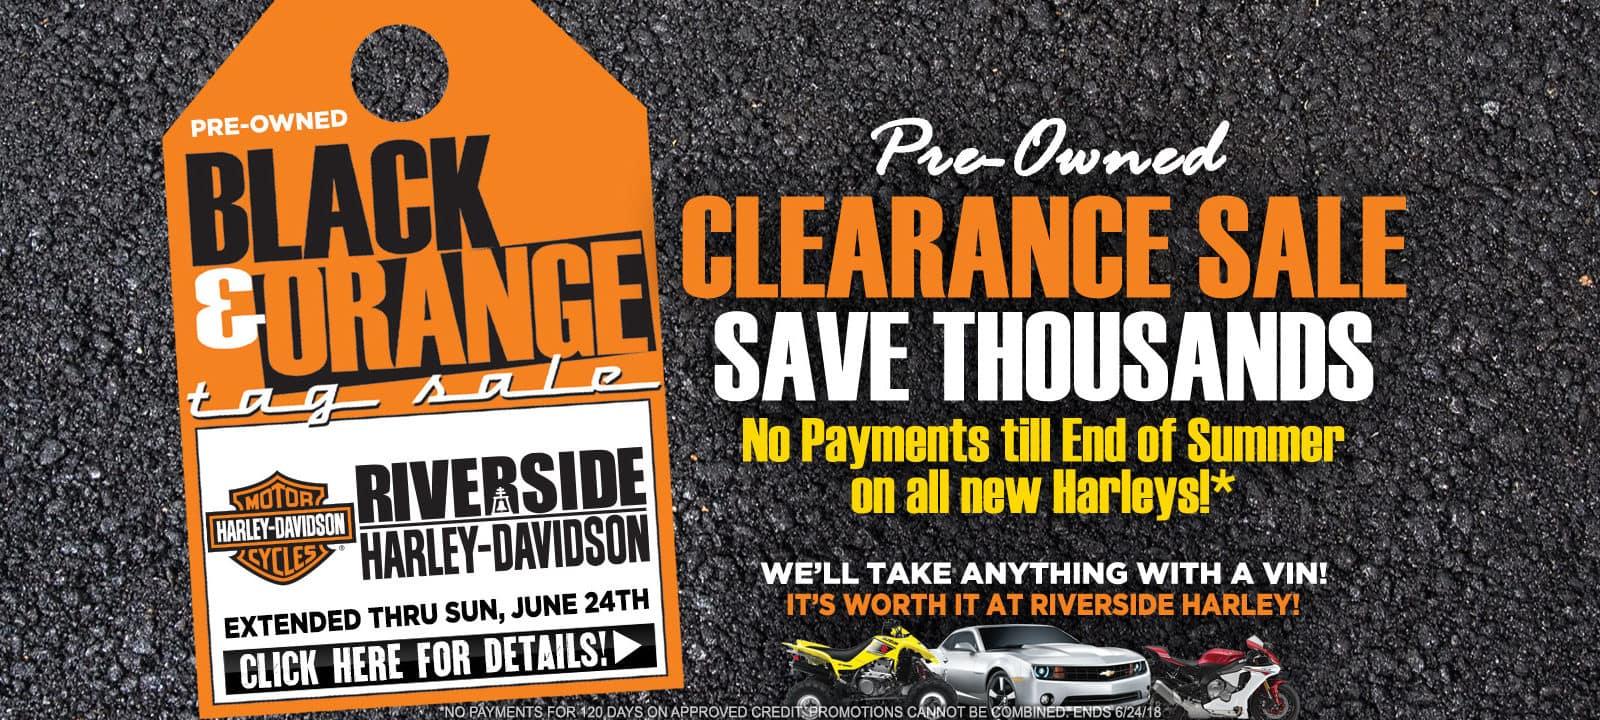 20180618-RSHD-1800x720-Black-&-Orange-Tag-Sale-&-No-Payments